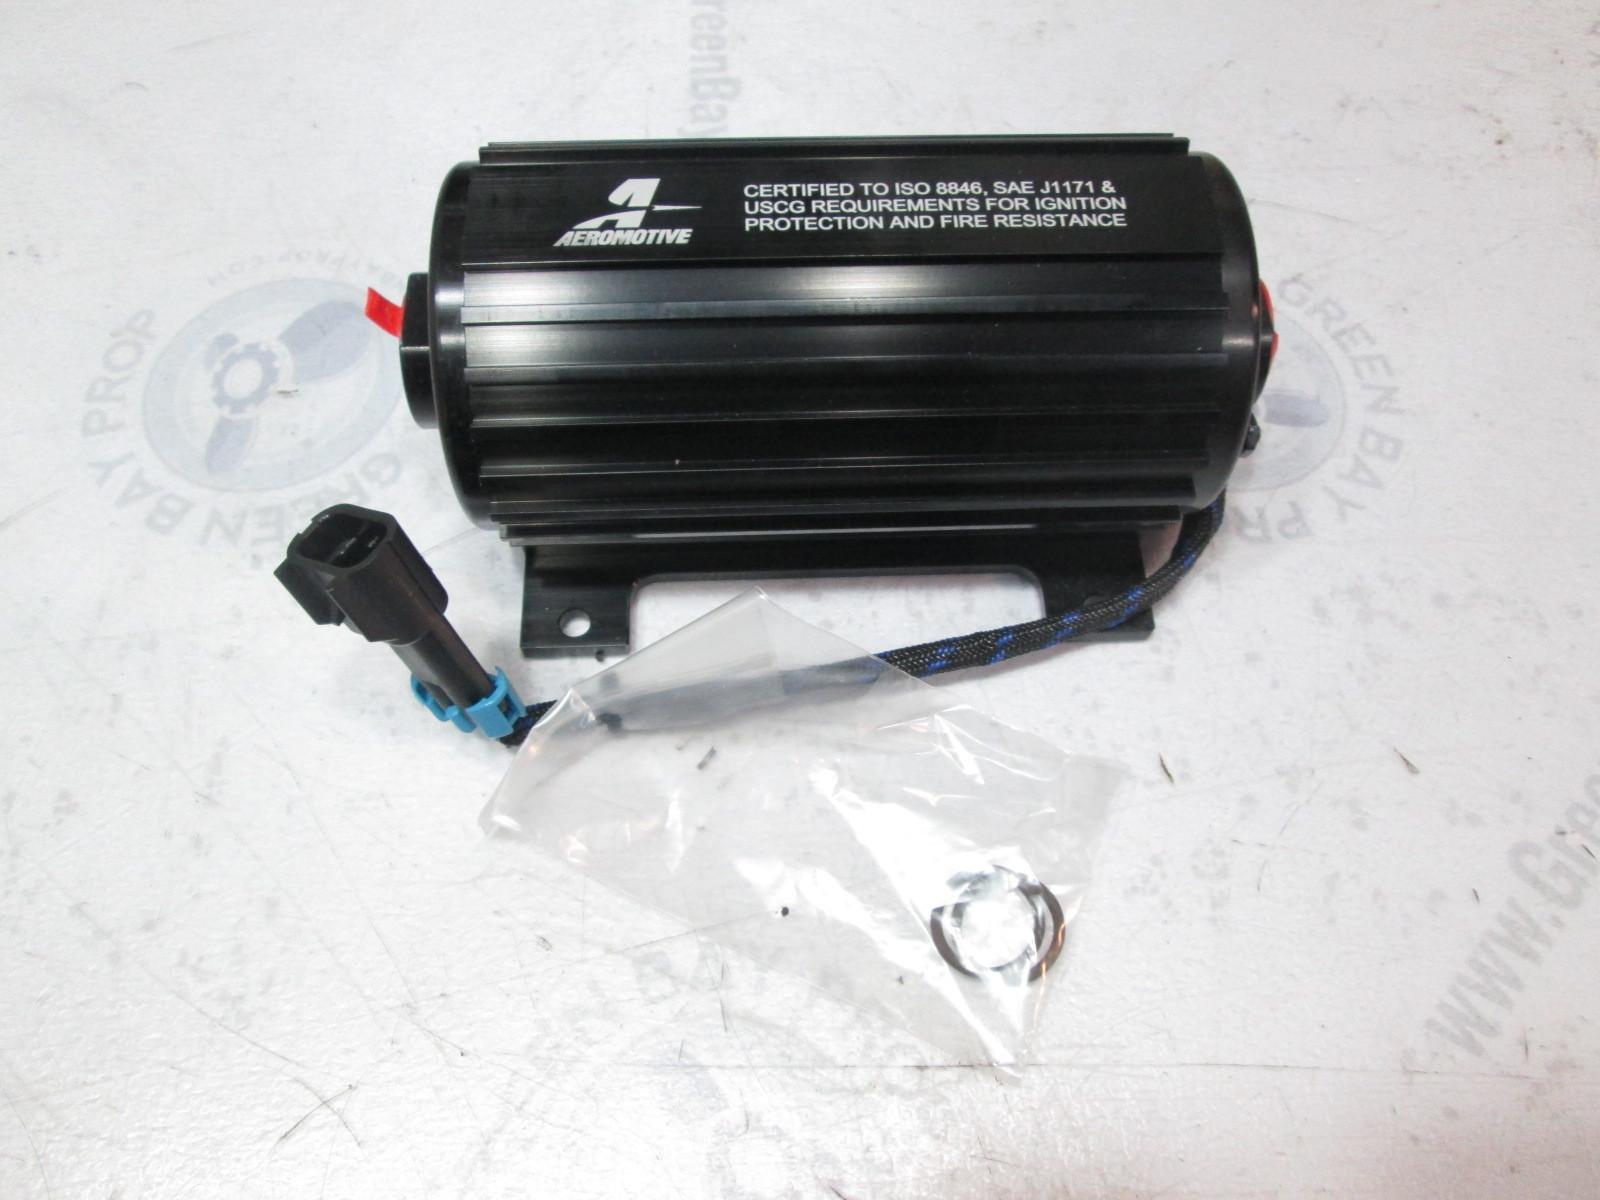 hight resolution of 11108 aeromotive a1000 marine electric fuel pump w mercury wire harness